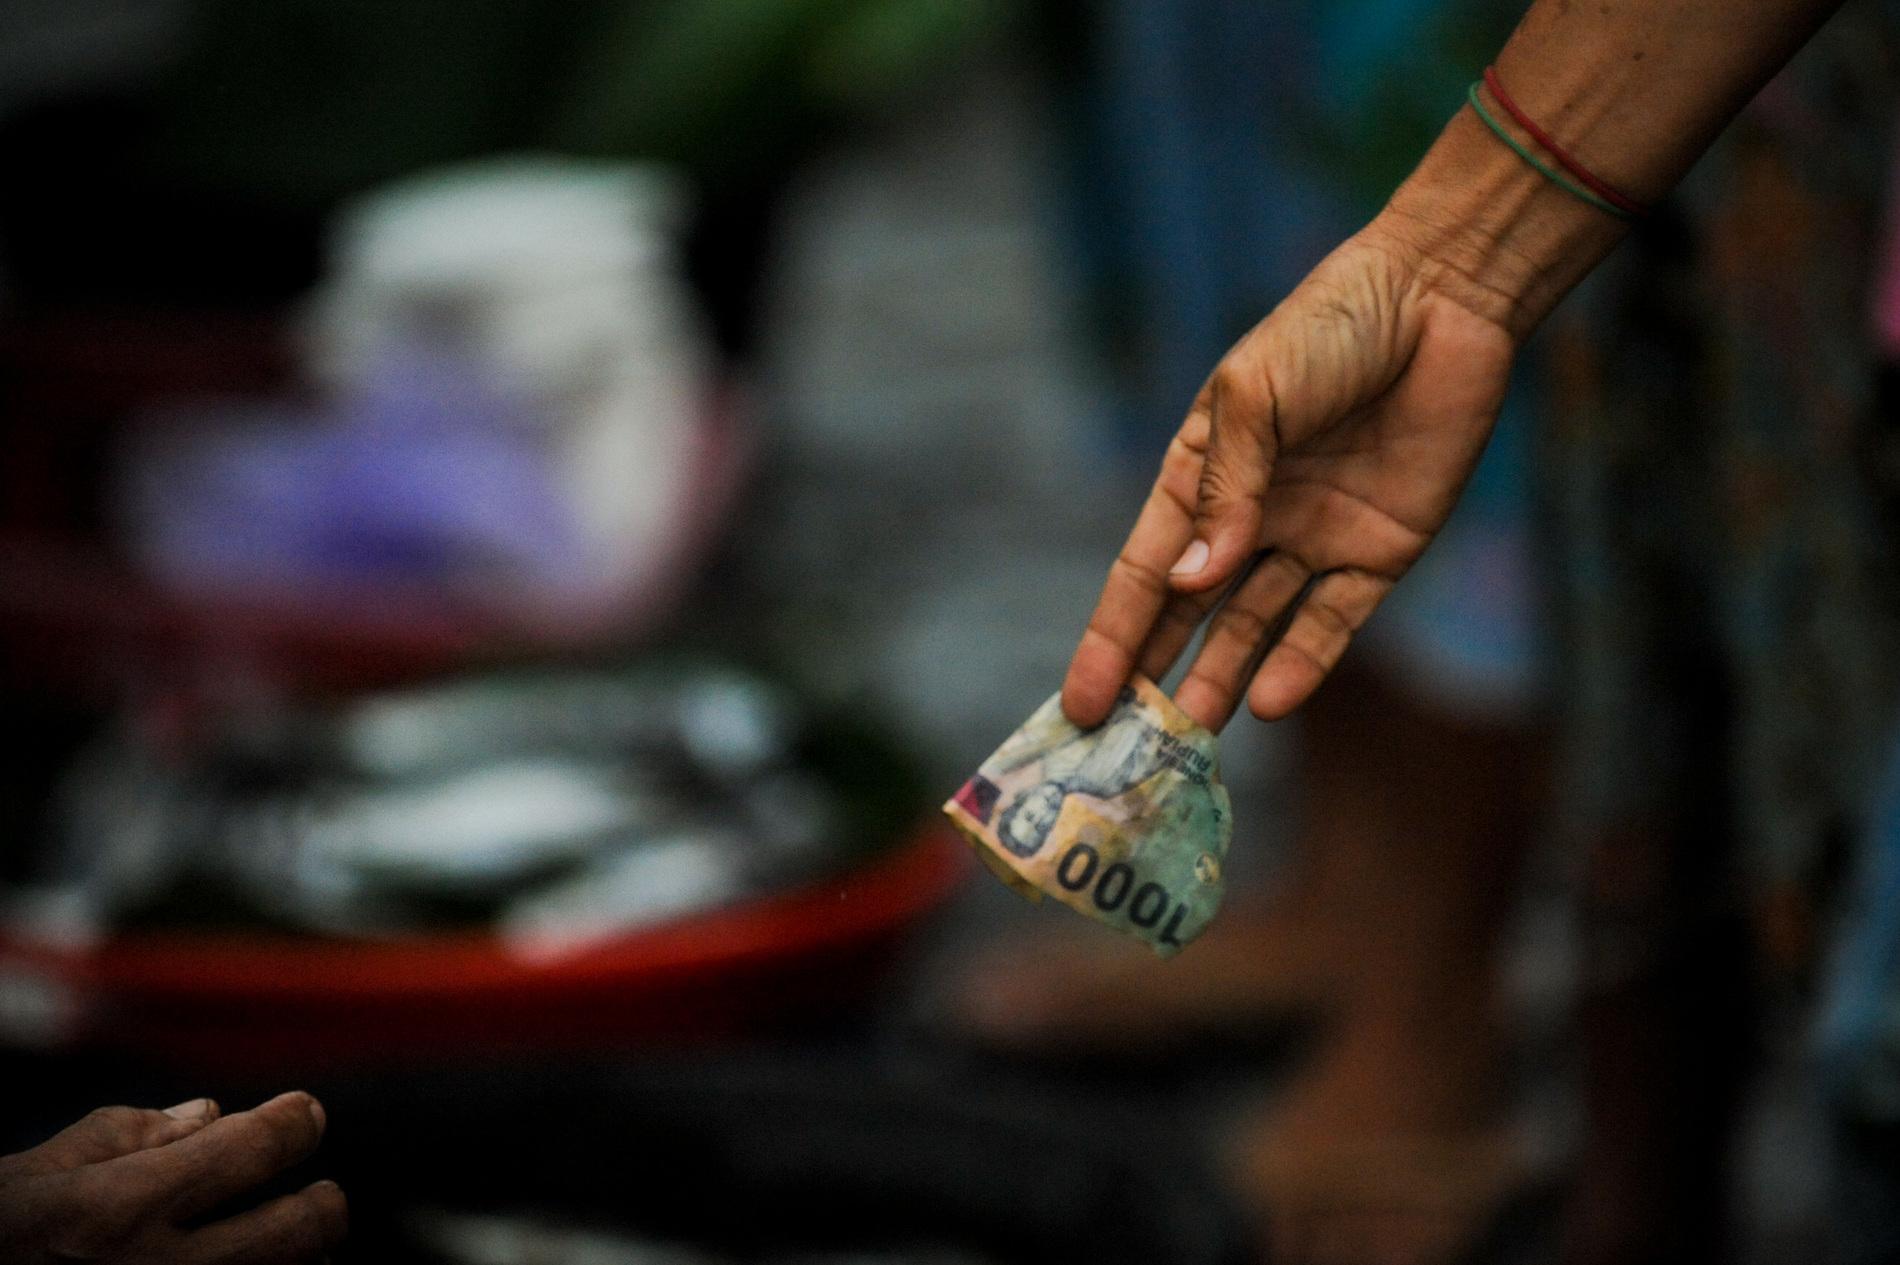 Global morgen: Global fattigdom, skatt og pandemien